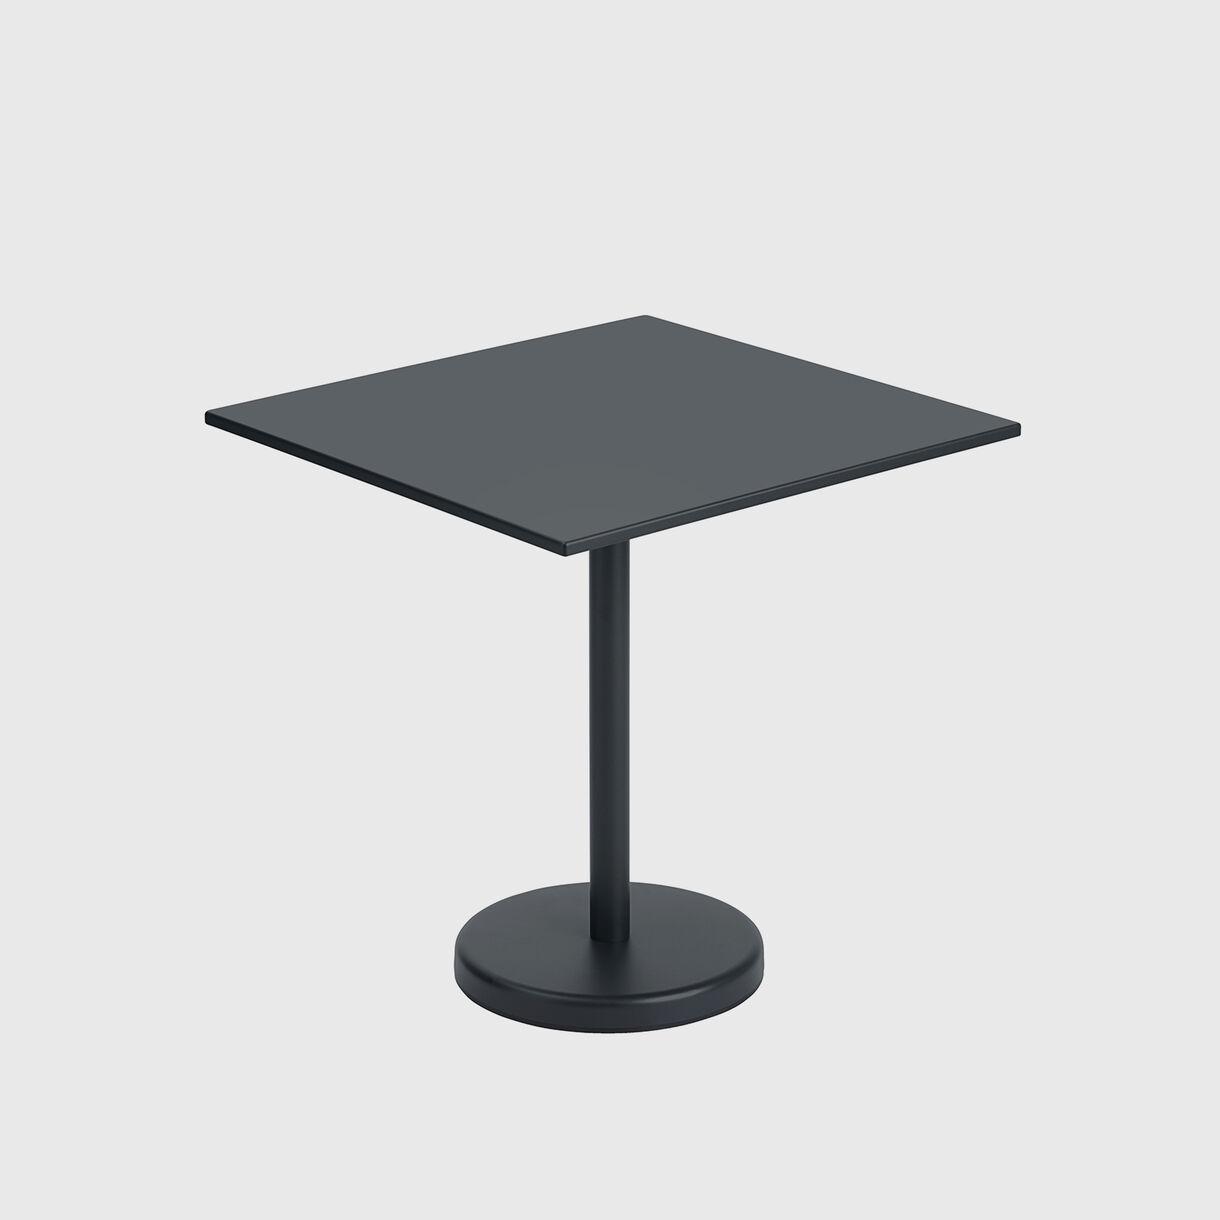 Linear Steel Cafe Table, Black